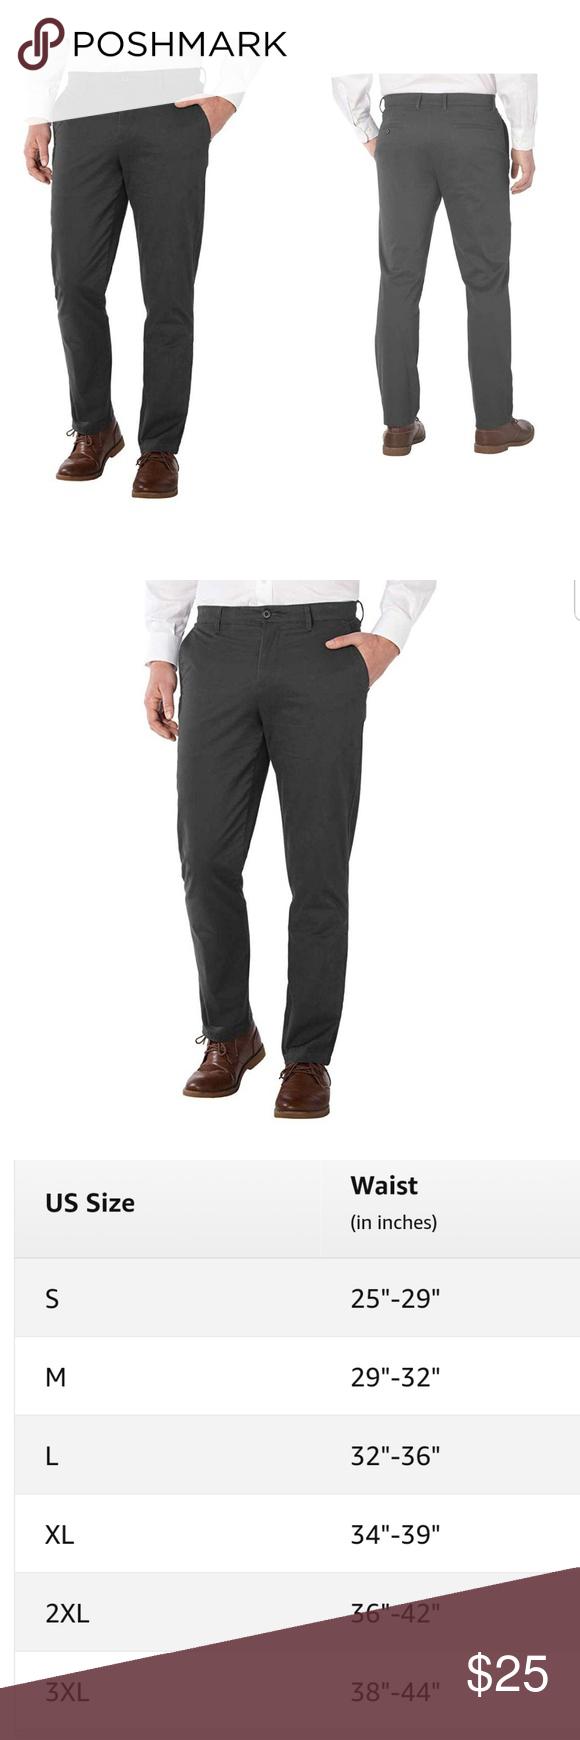 English Laundry Men Comfort Chino Leg Pants Nwt Leg Pants Khaki